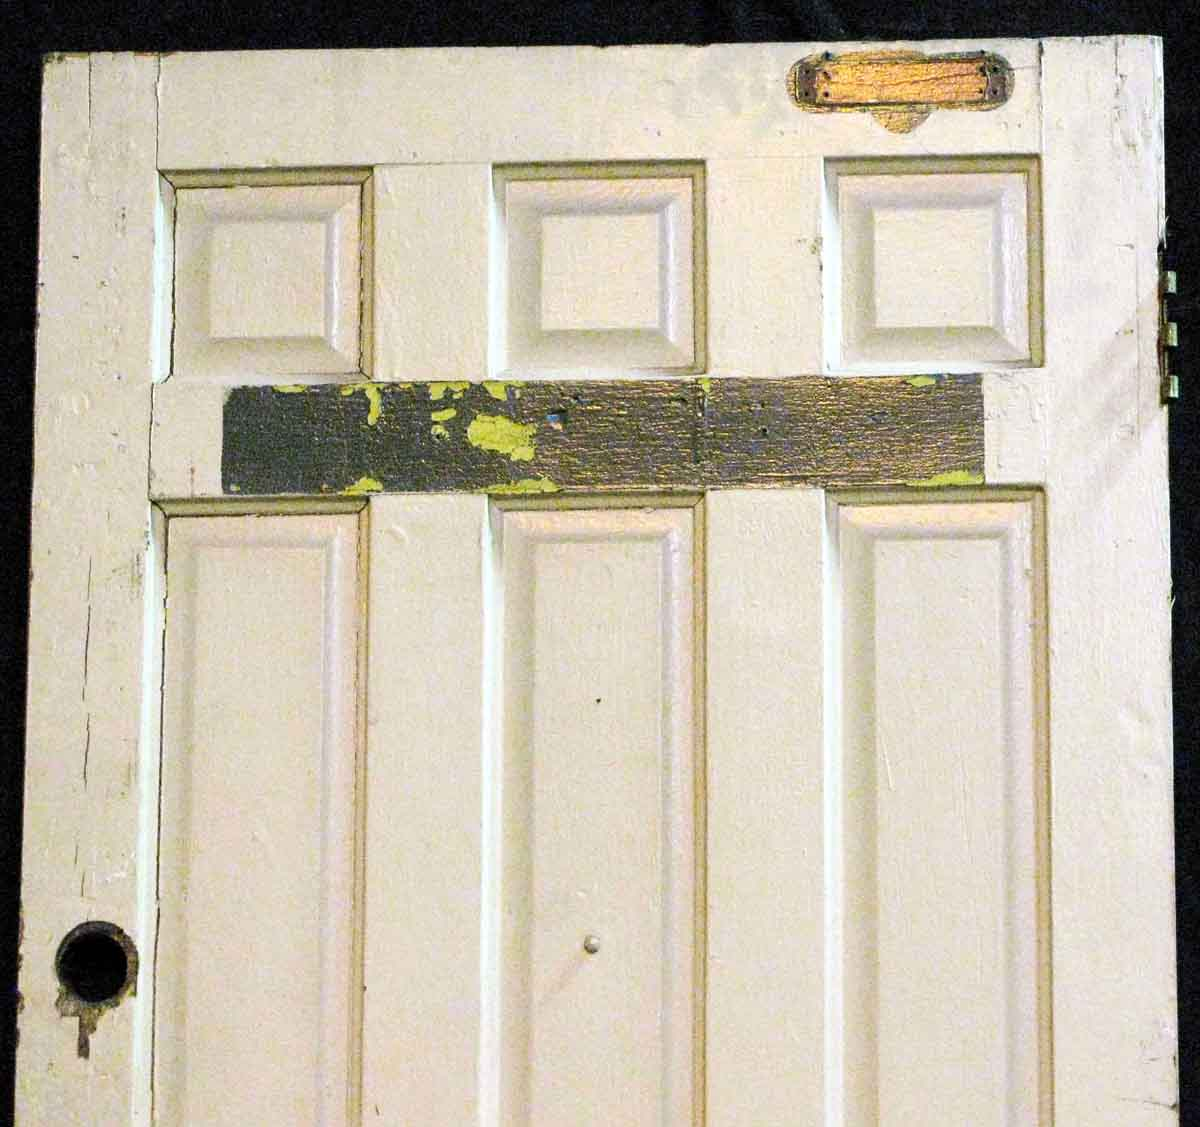 Oak Entry Door With Raised Panels